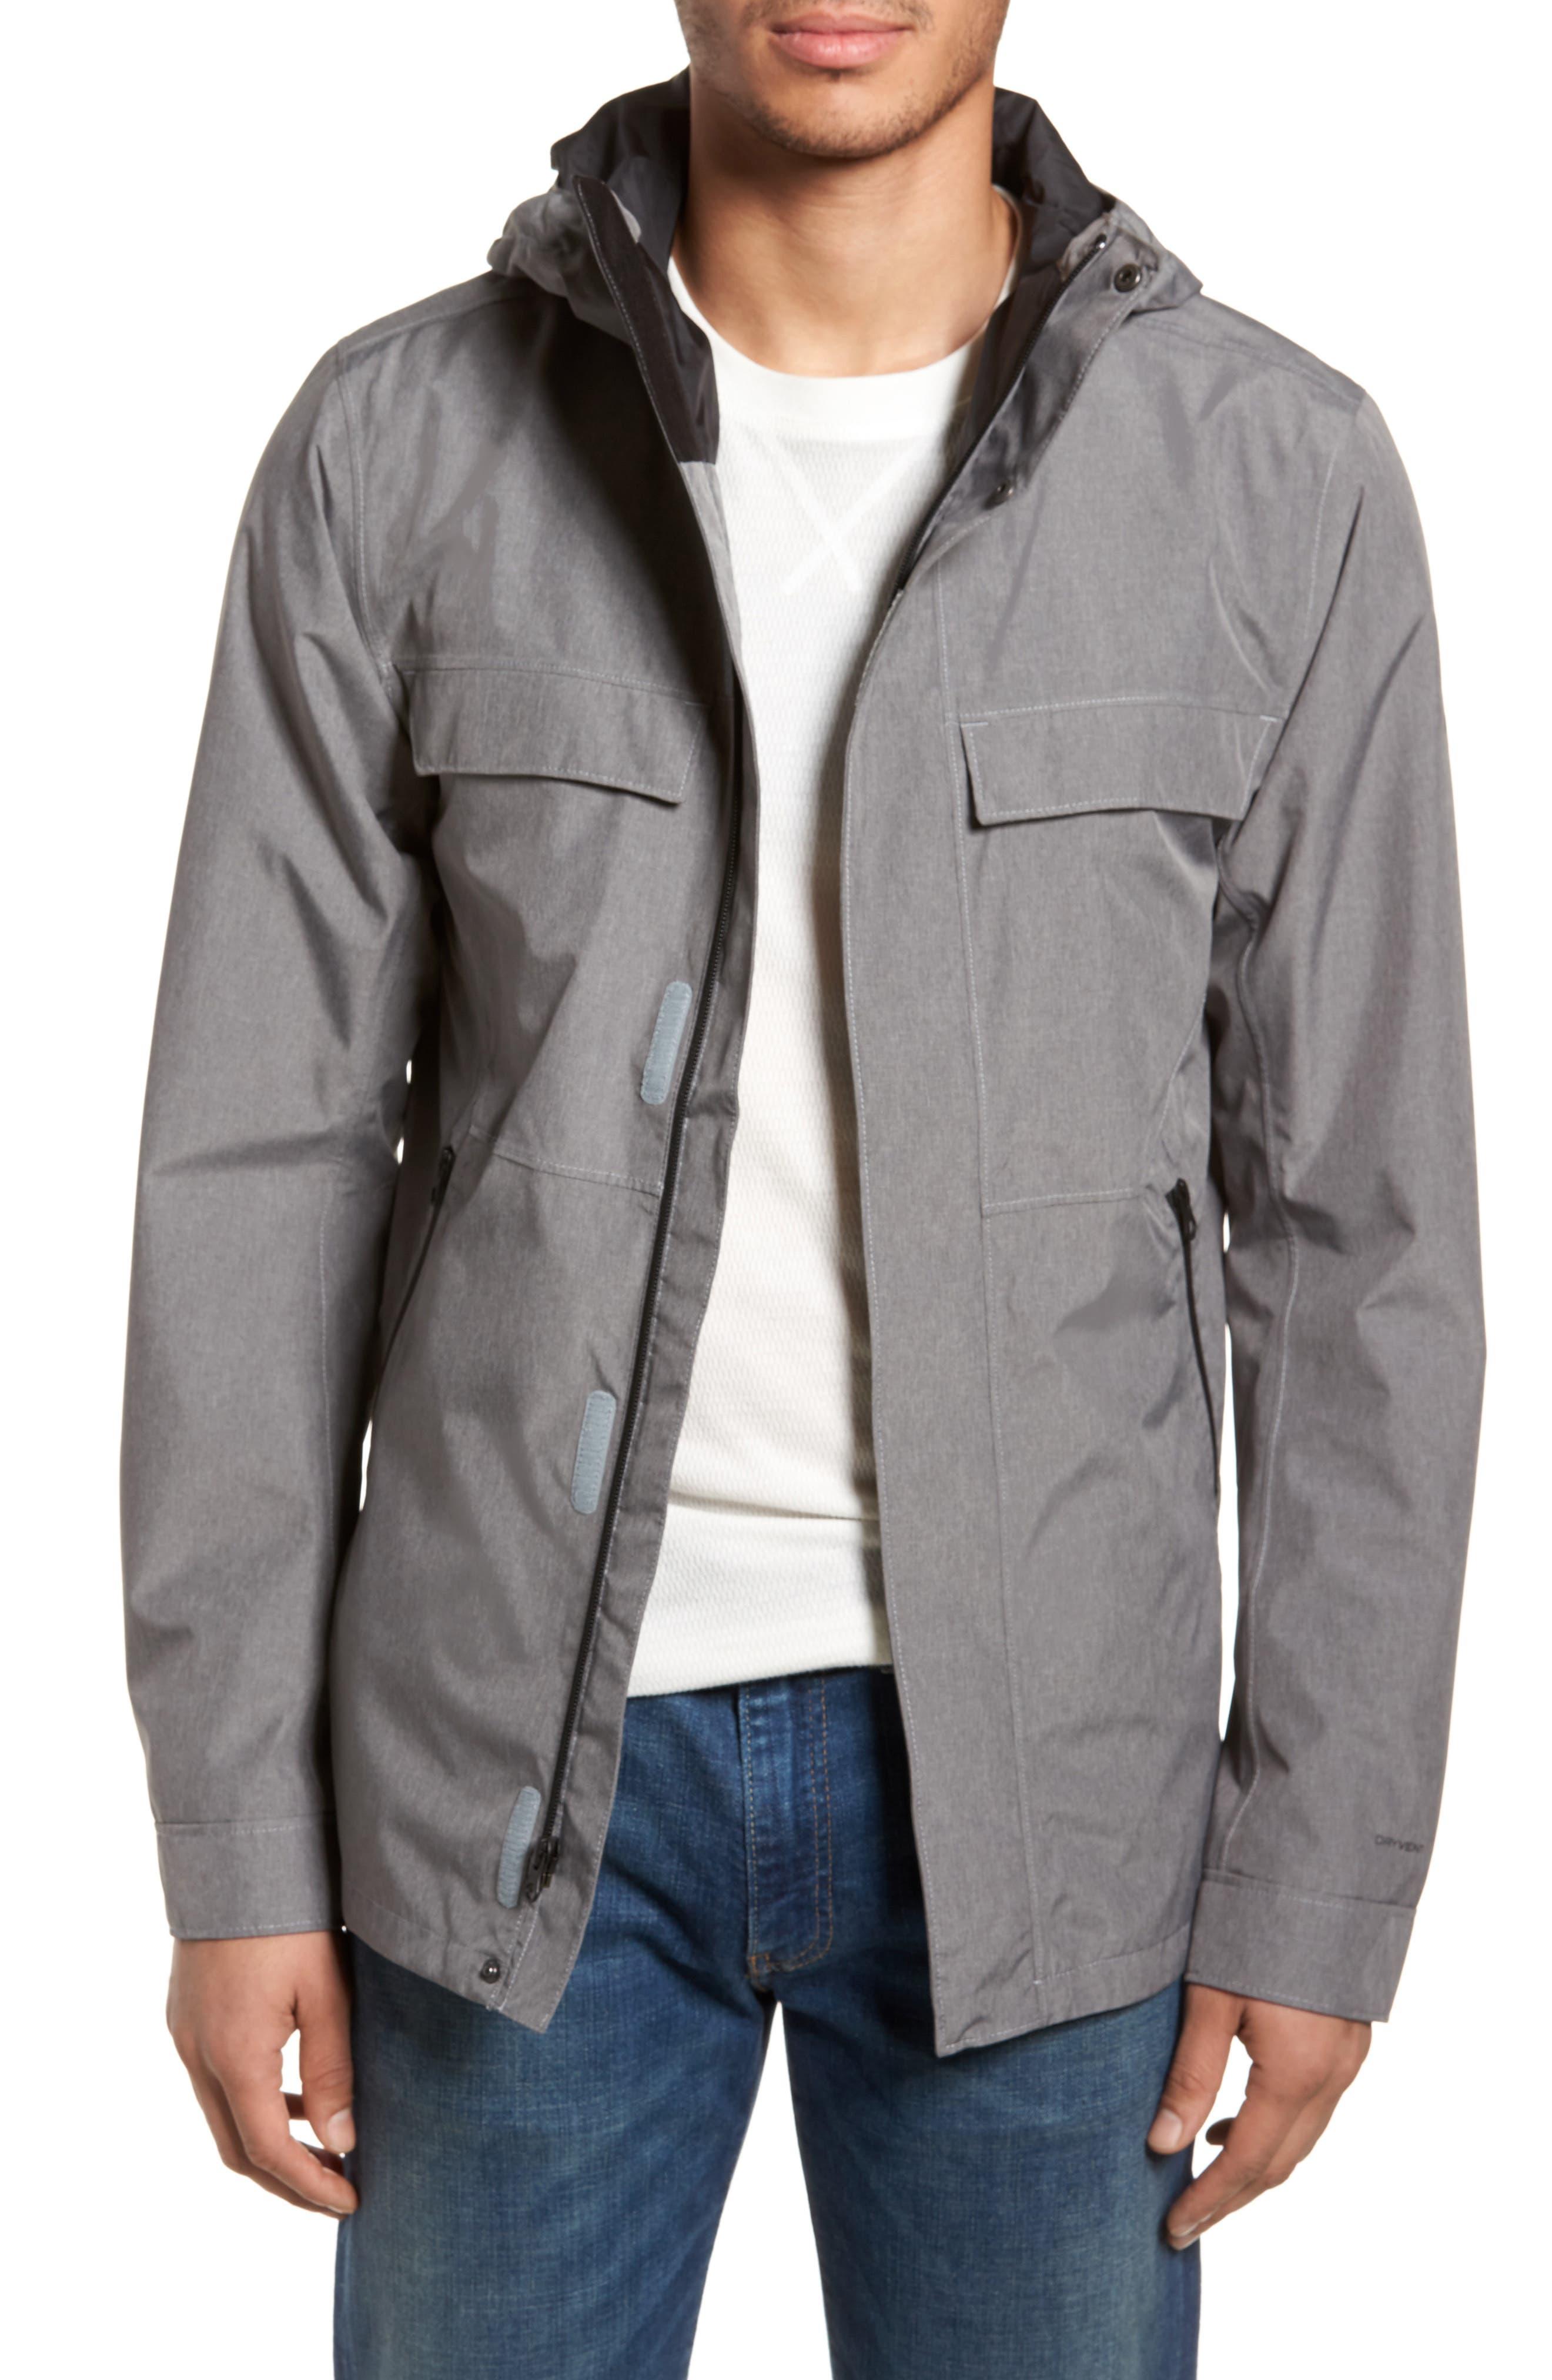 Jenison II Insulated Waterproof Jacket,                         Main,                         color, TNF MEDIUM GREY HEATHER